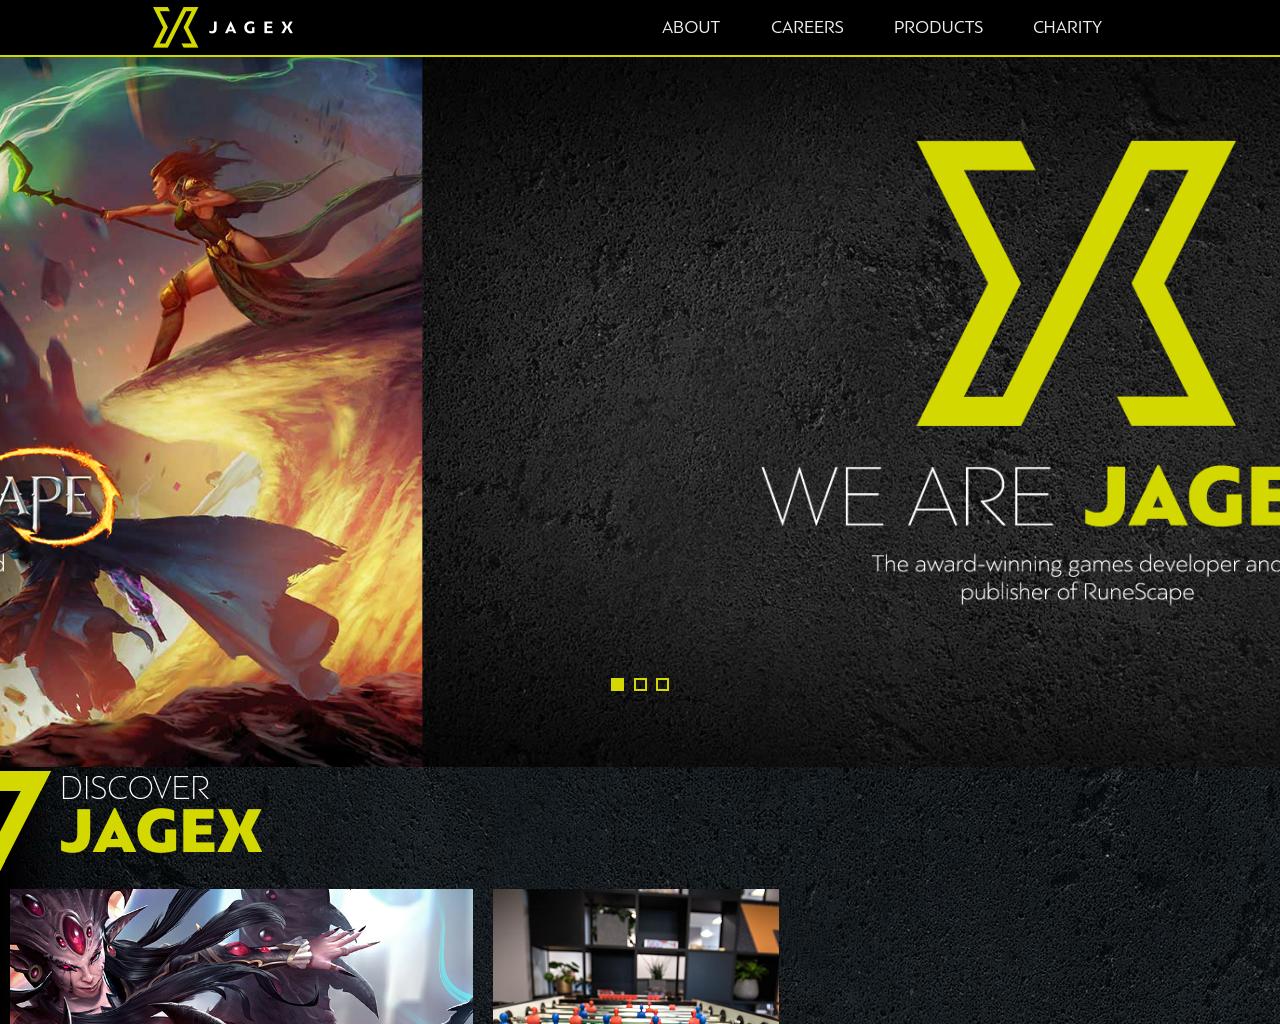 Jagex-Game-Studio-Advertising-Reviews-Pricing